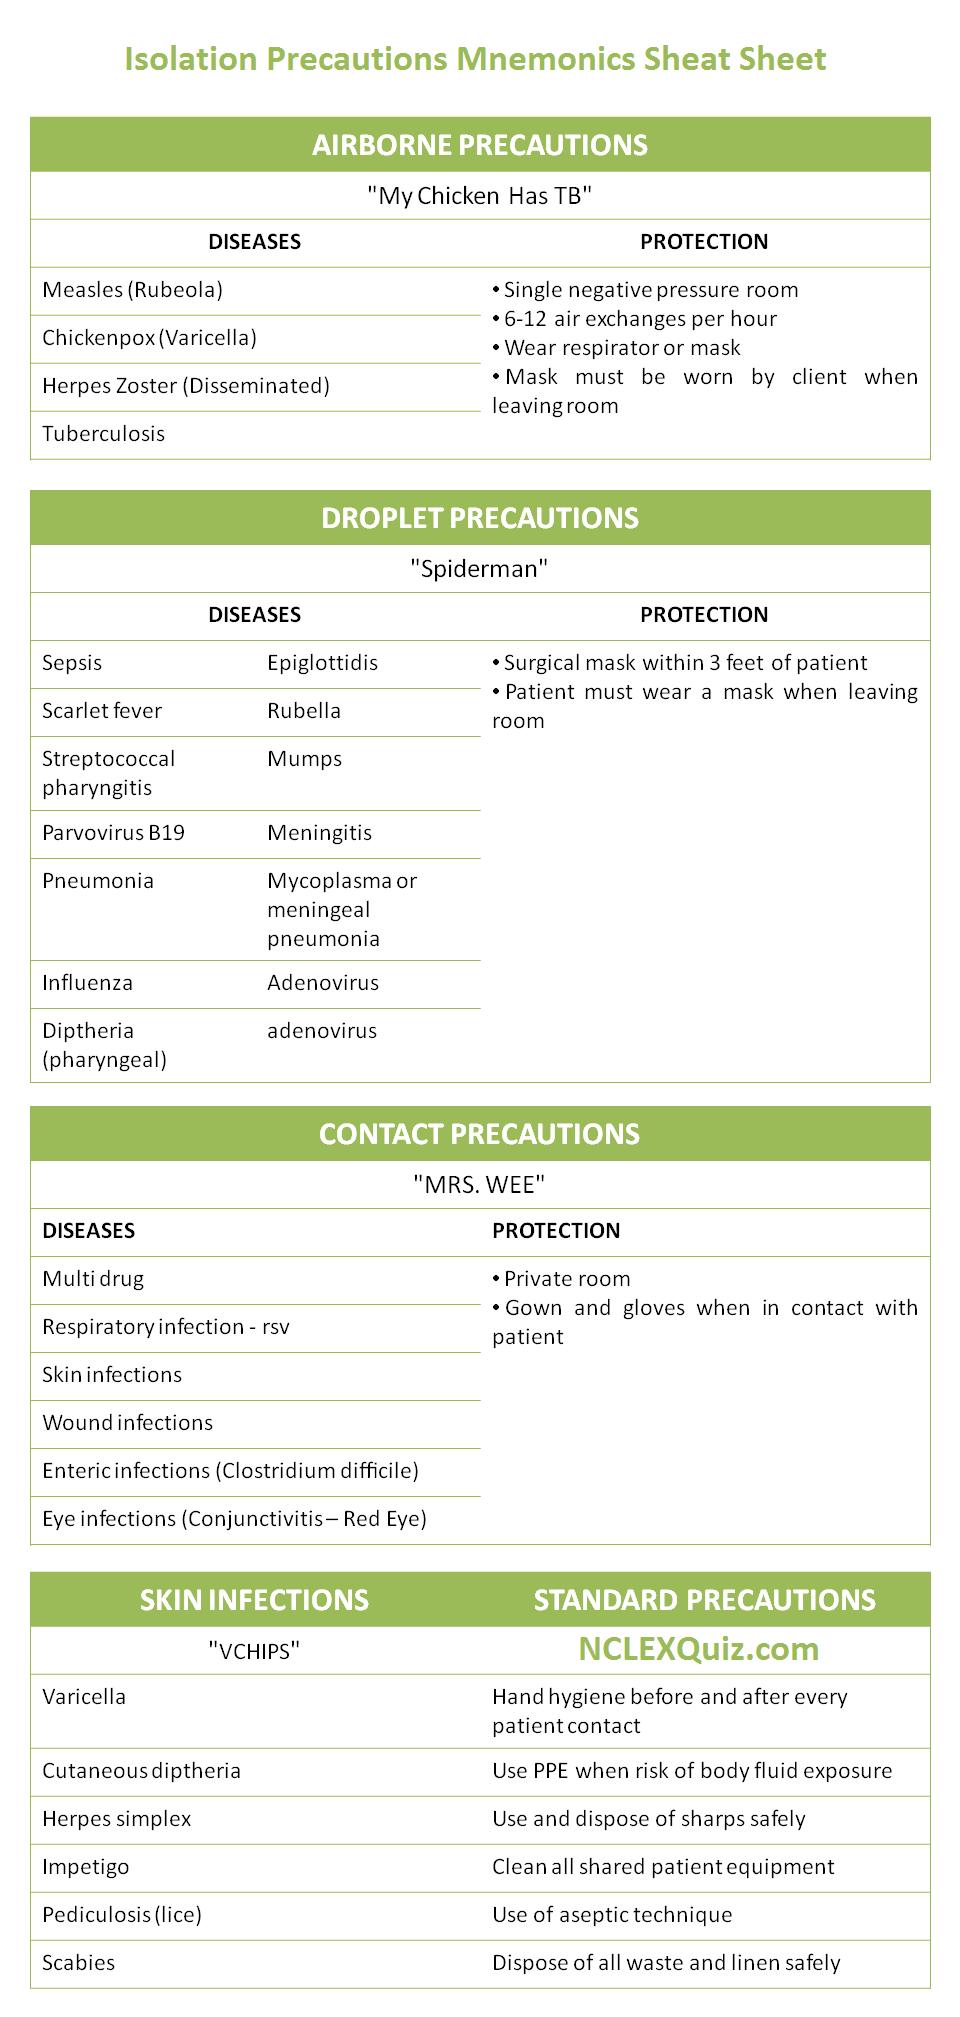 Isolation Precautions Mnemonics Cheat Sheet Nclex Quiz